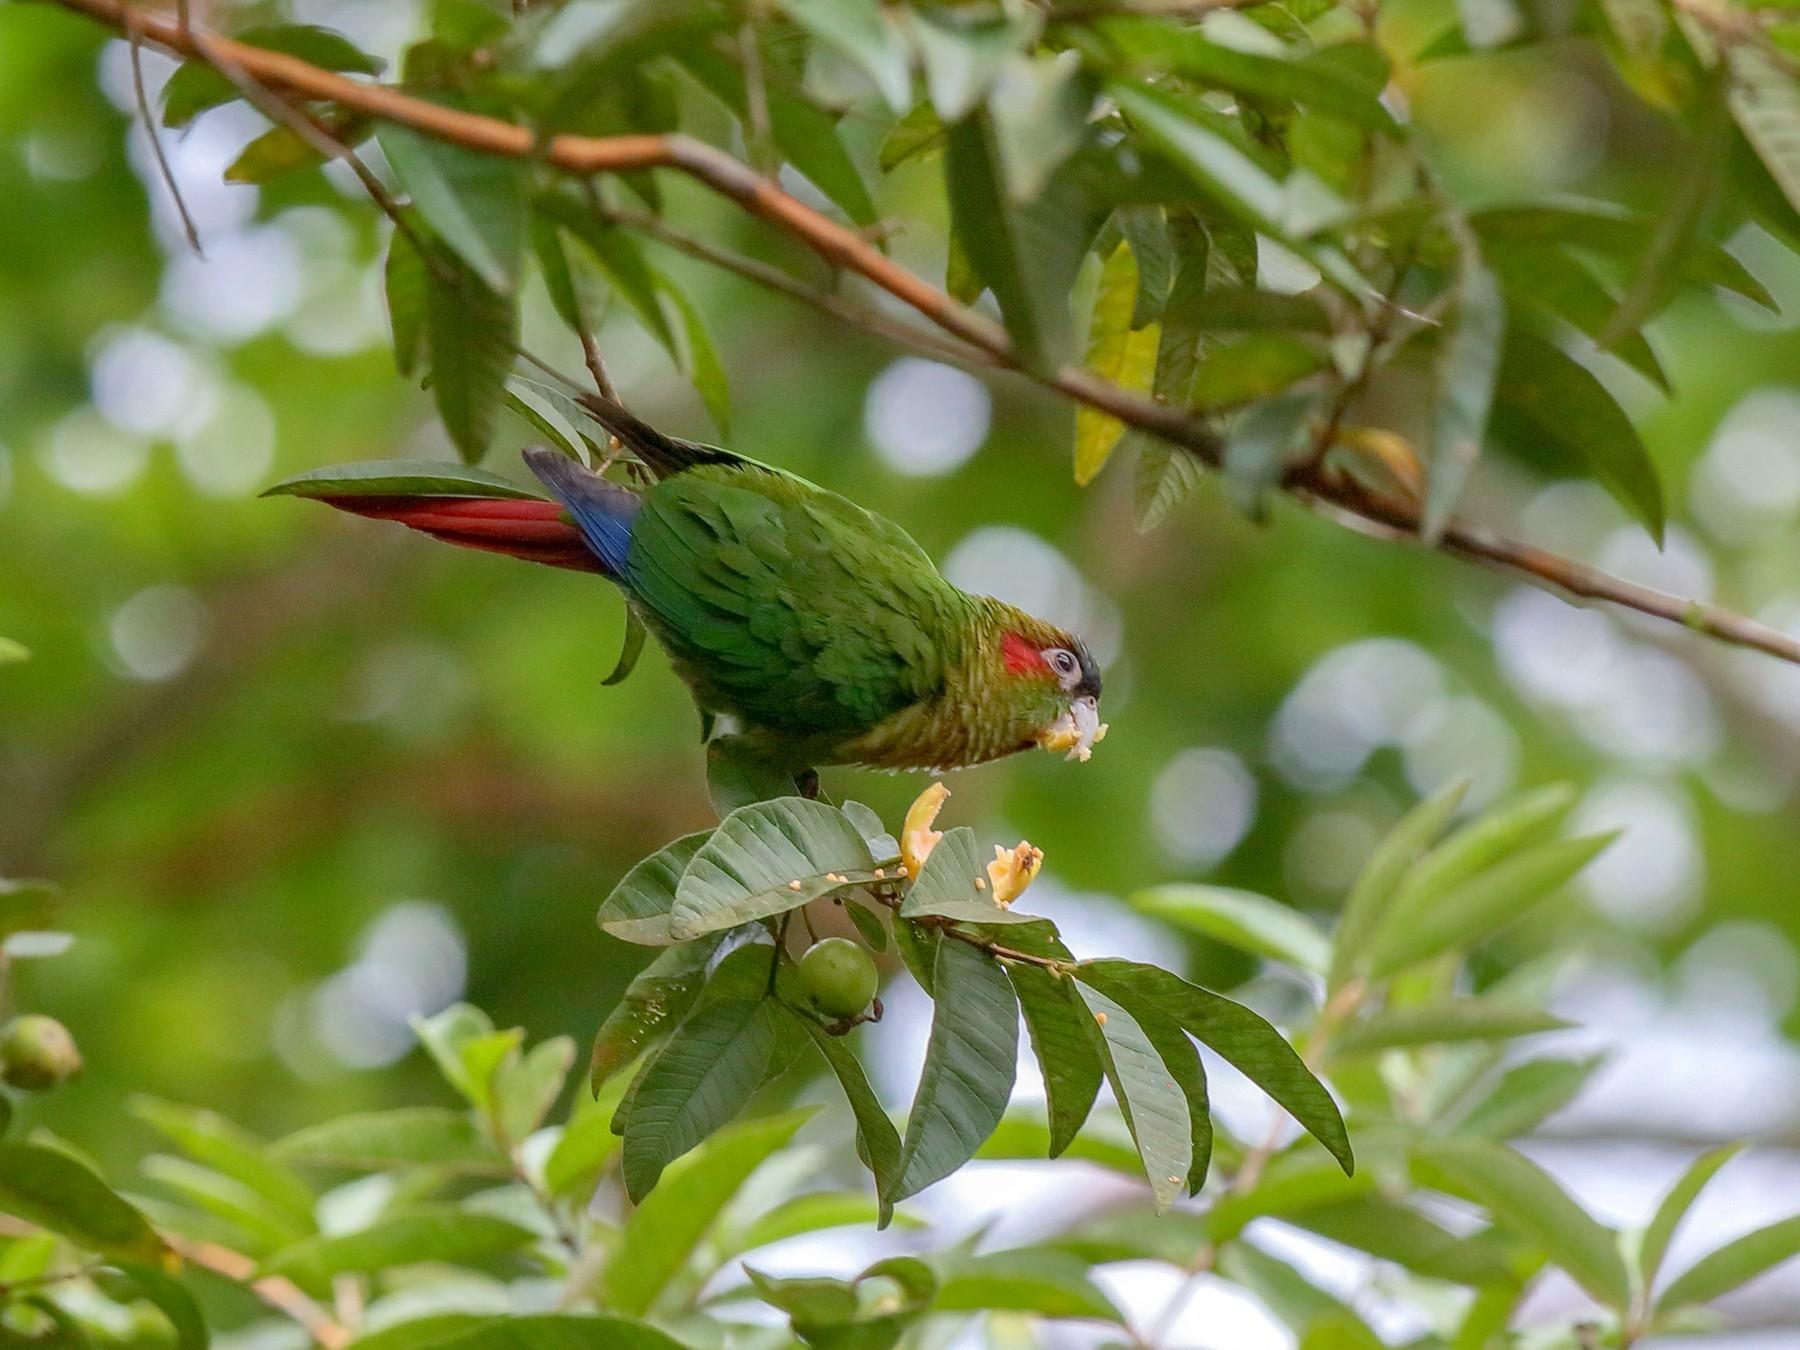 Red-eared Parakeet - Holger Teichmann